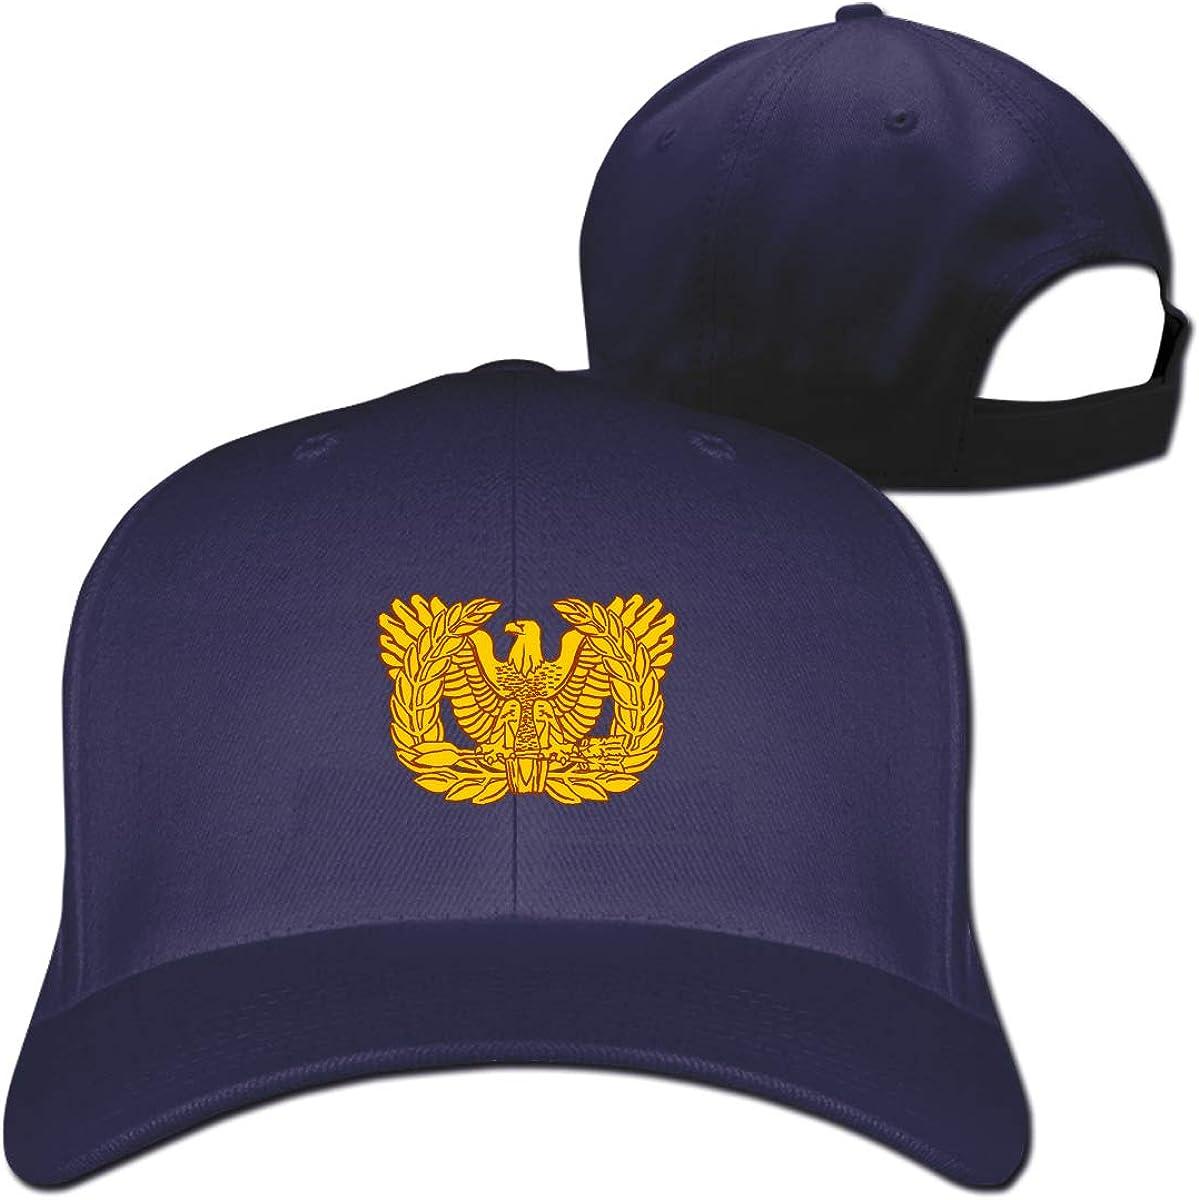 Us Army Chief Warrant Officer 4 Veteran Unisex Soft Casquette Cap Fashion Hat Vintage Adjustable Baseball Caps